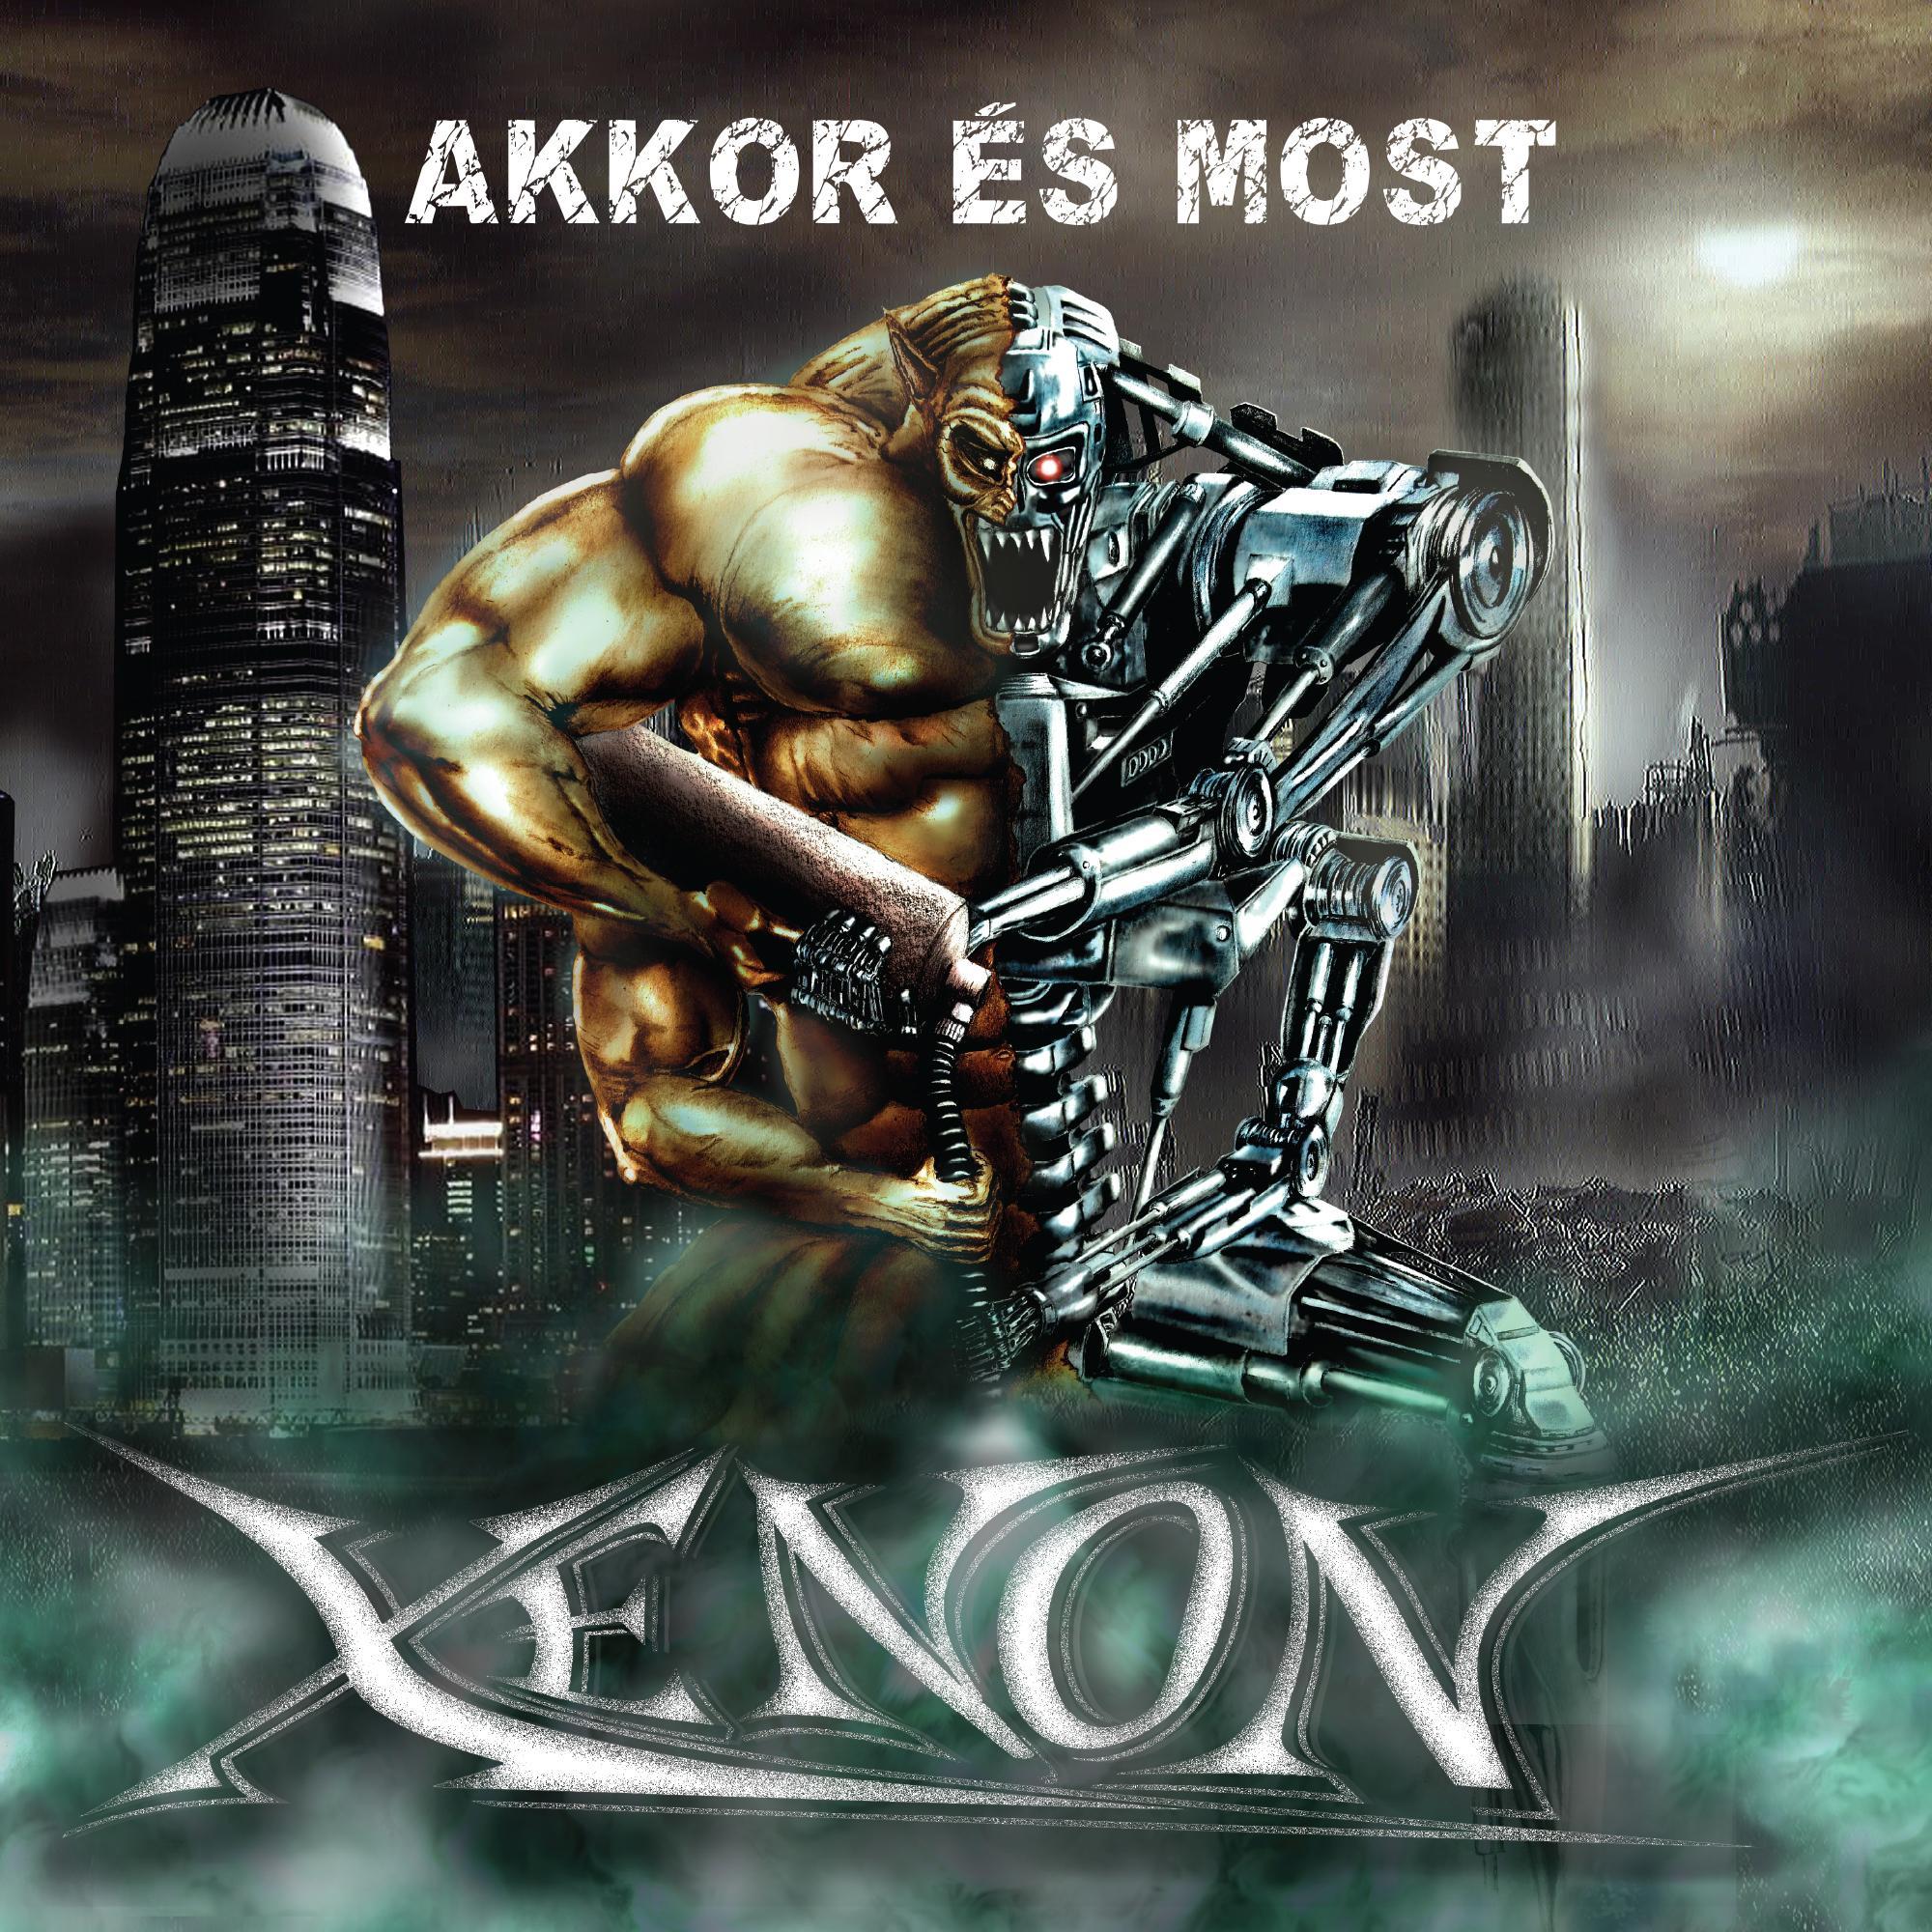 XENON - AKKOR ÉS MOST (CD)